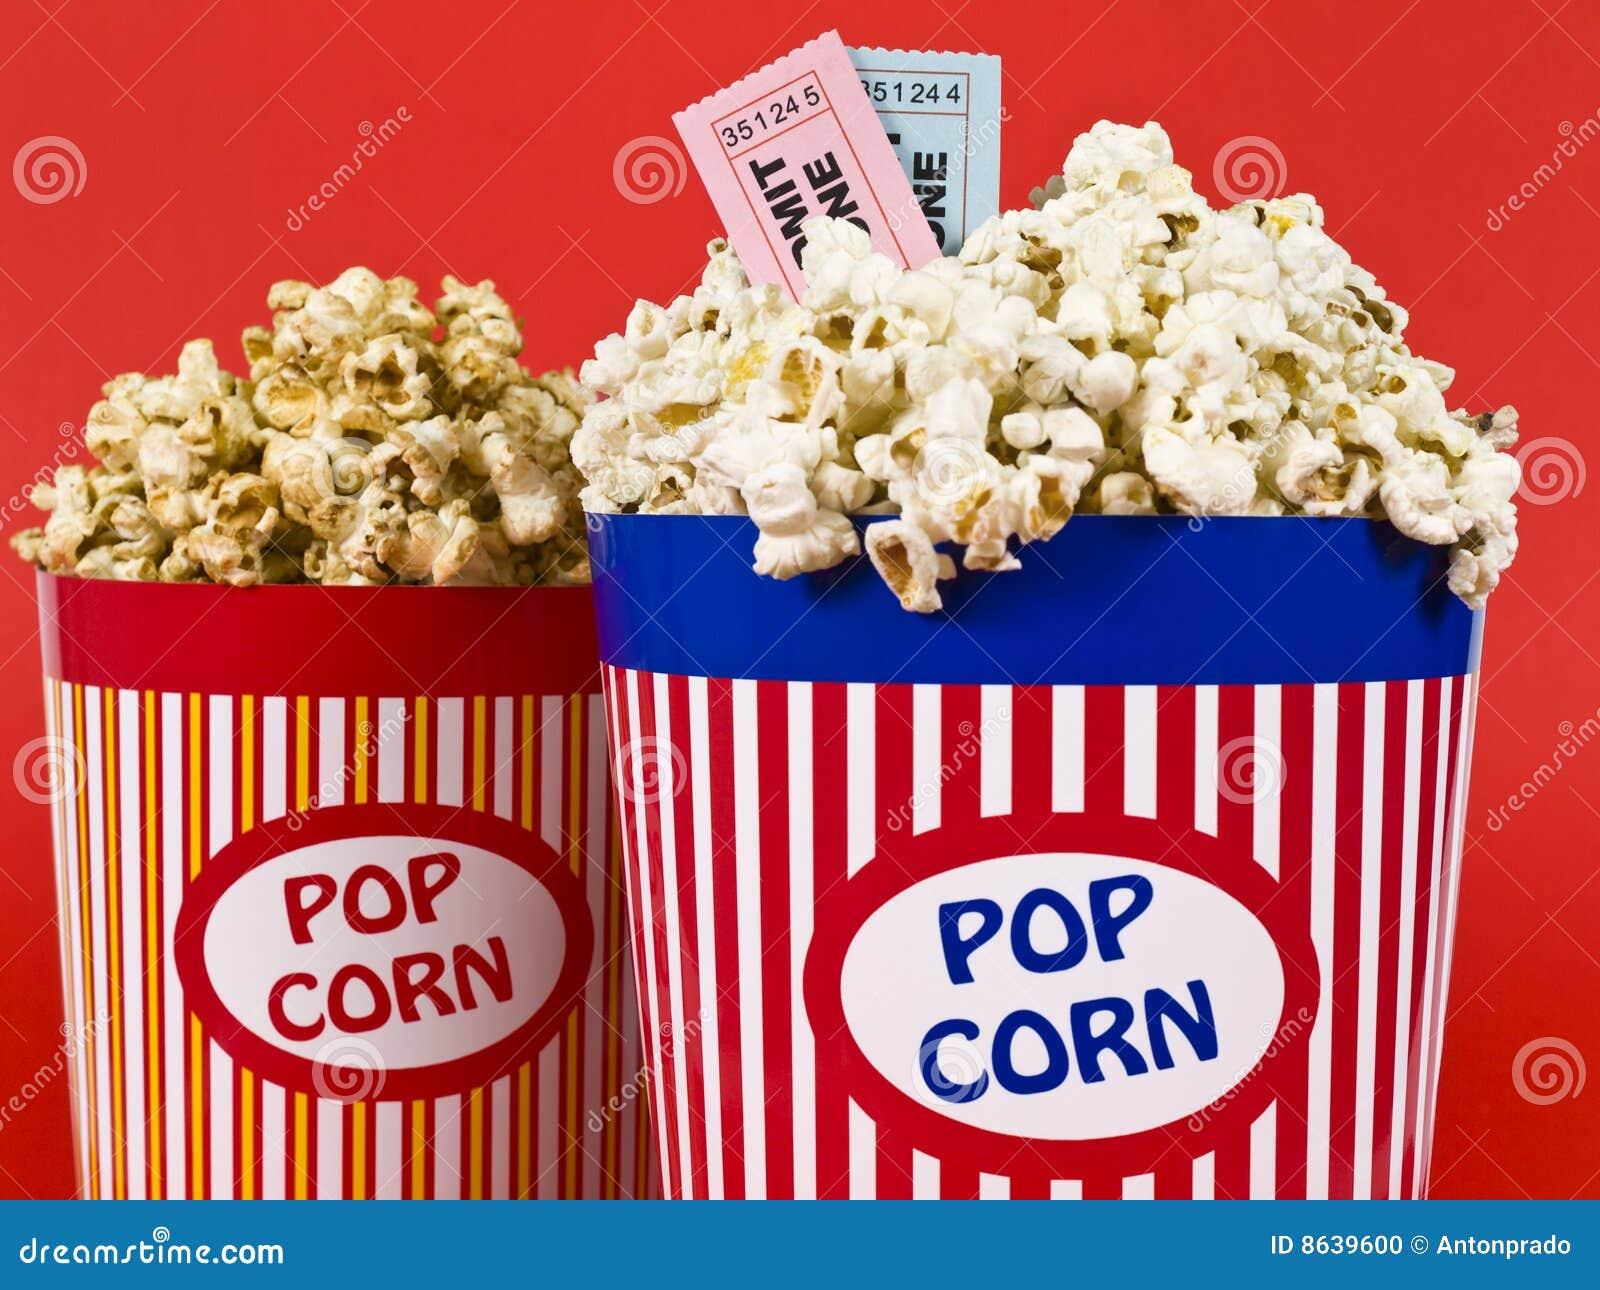 dating popcorn radiogenic isotopes dating